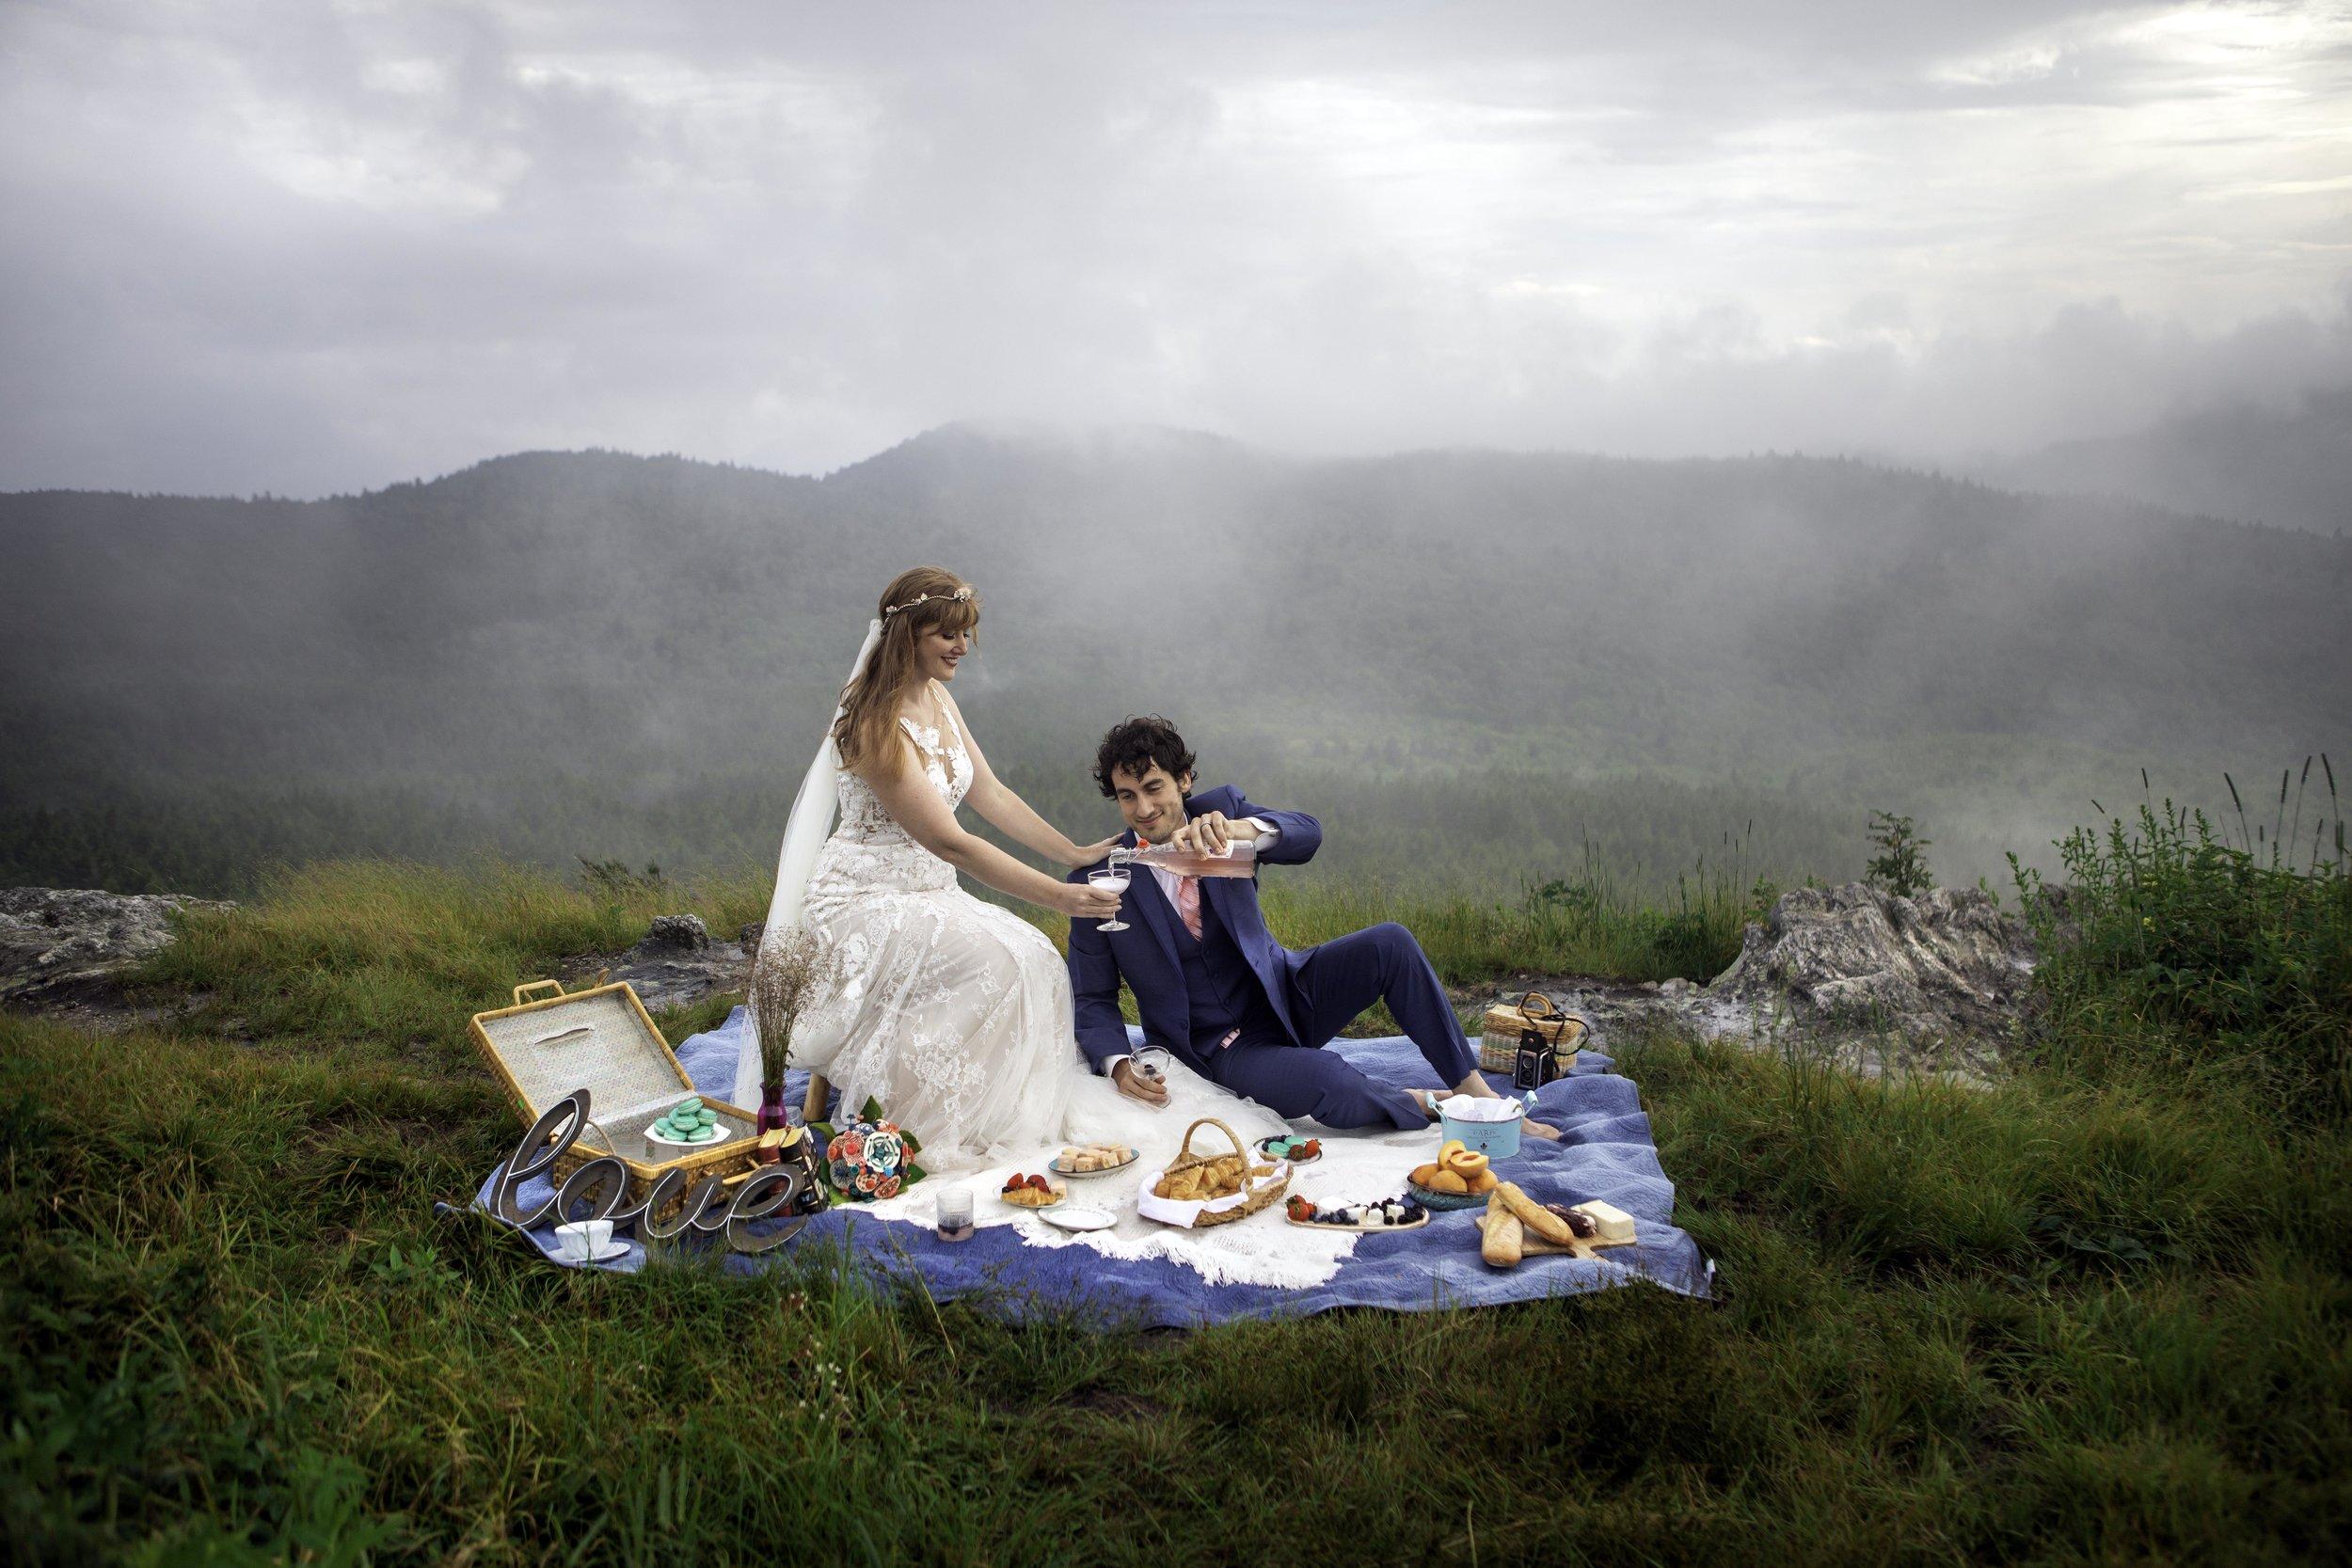 Blue Ridge Mountain Top Elopement With Romantic Picnic- July 2019